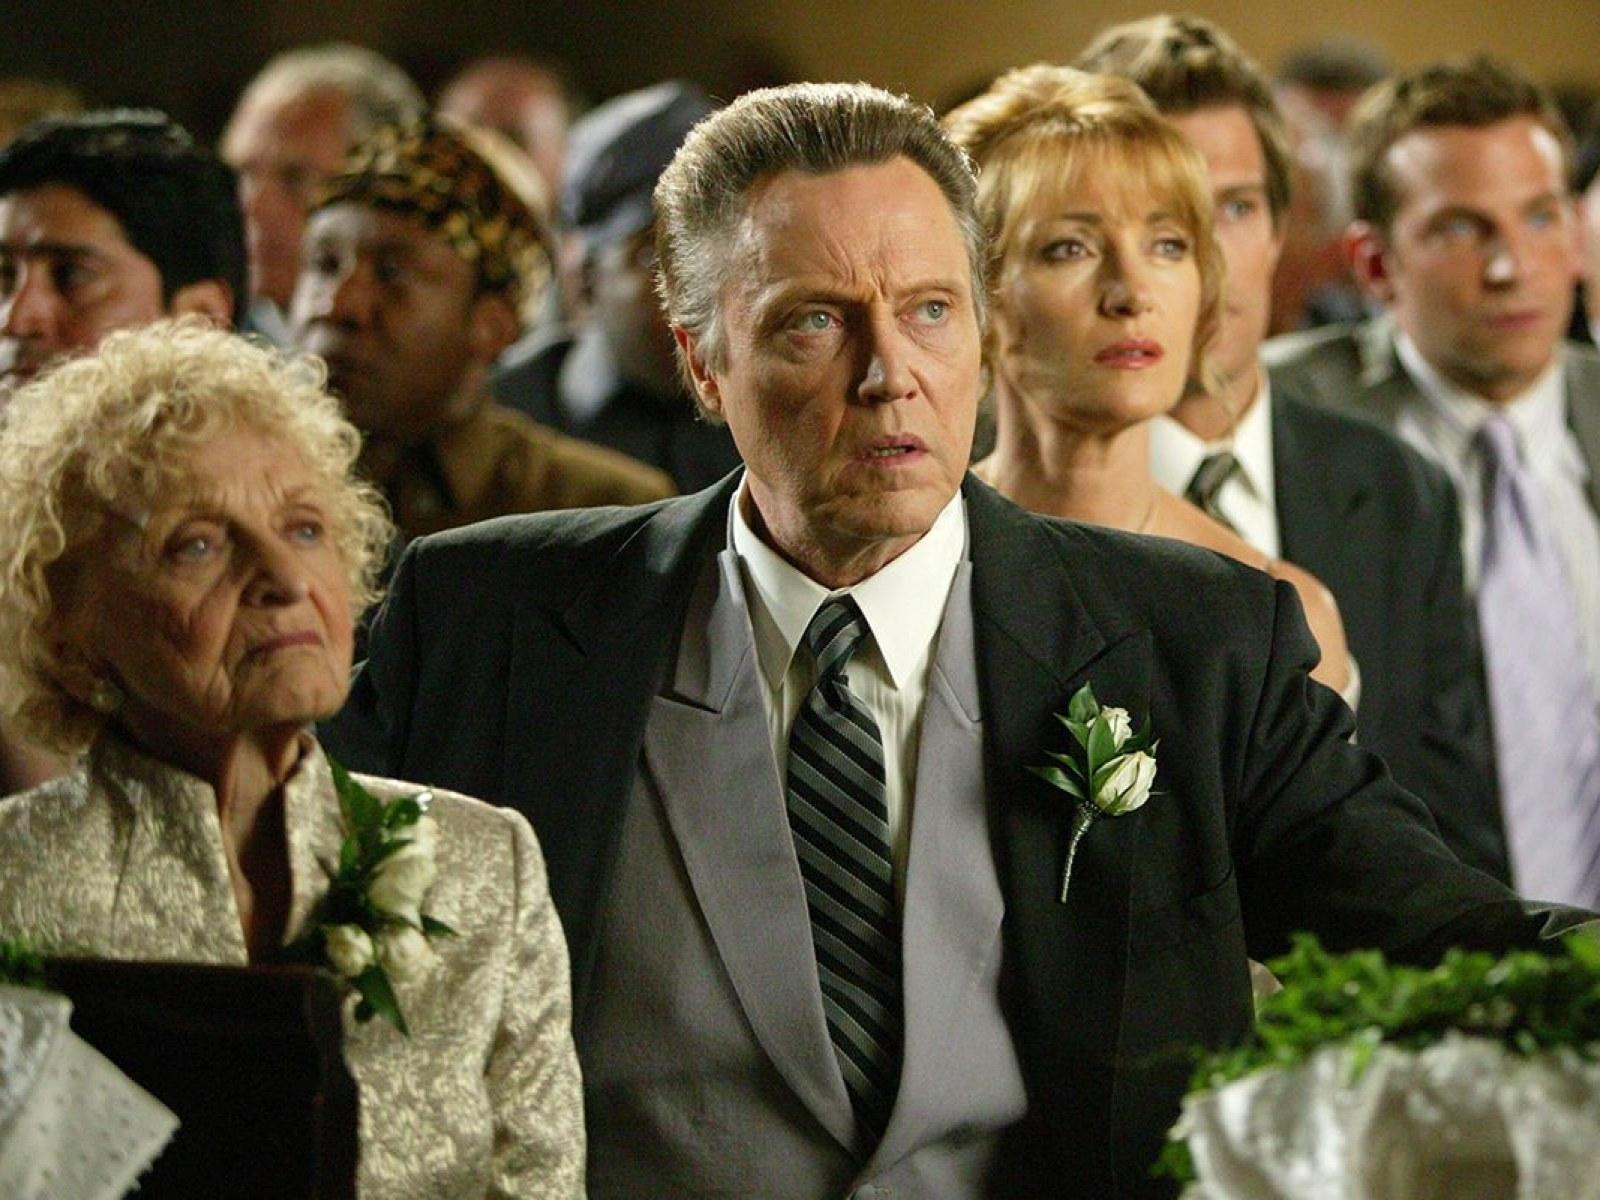 Imdb Wedding Crashers.Christopher Walken S 76th Birthday His 20 Best Movies Ranked